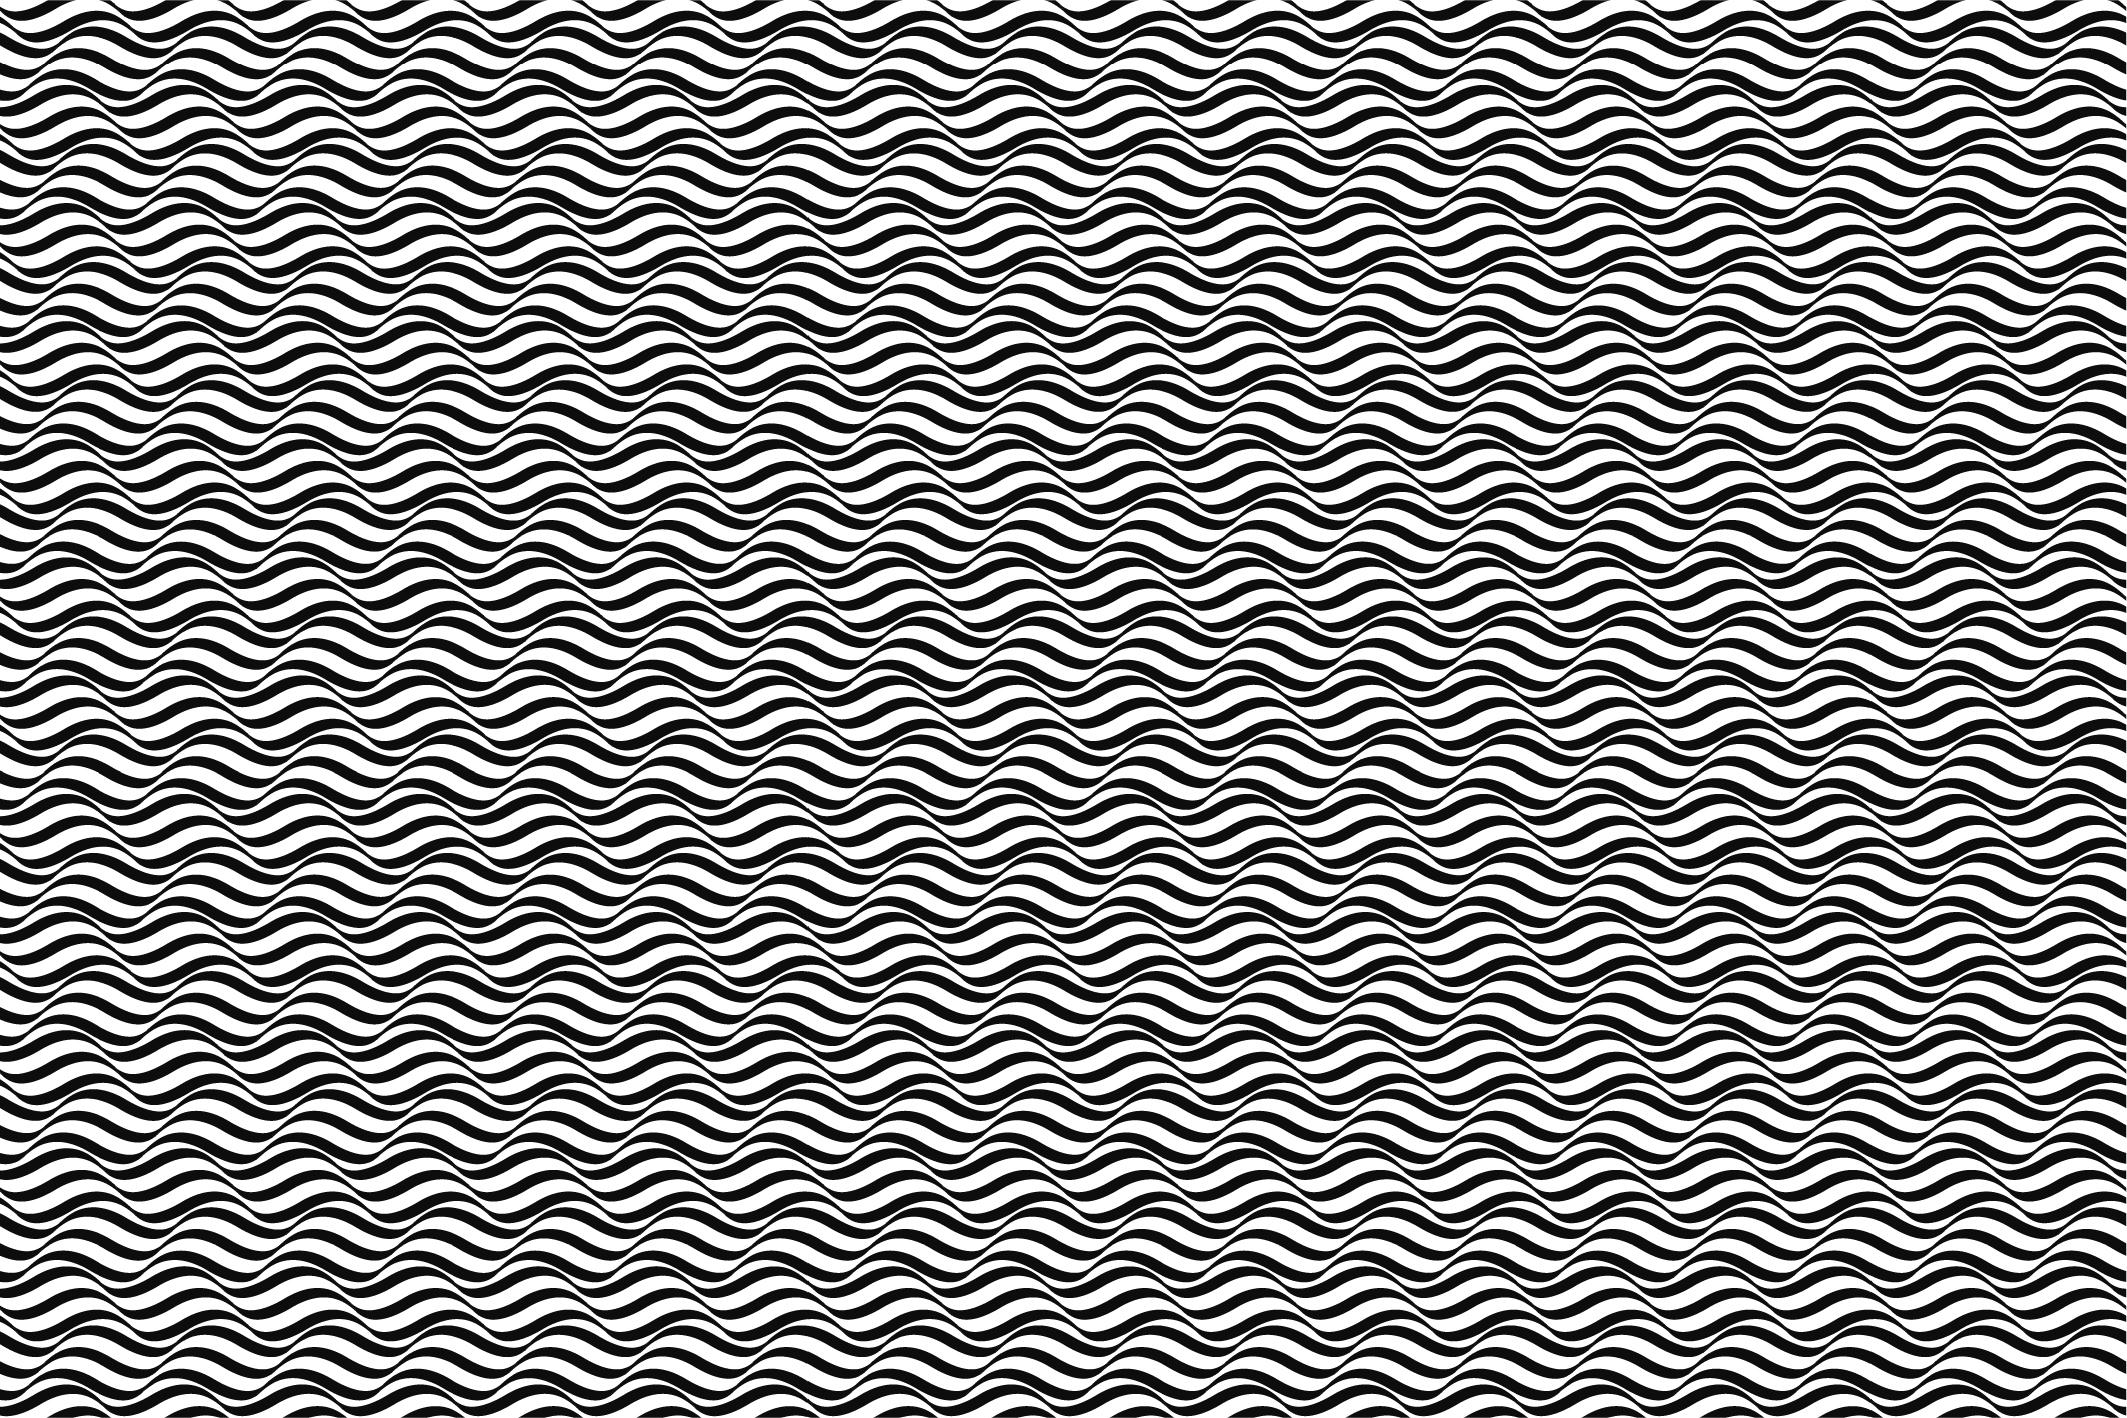 Wave&Zigzag seamless patterns. B&W. example image 4